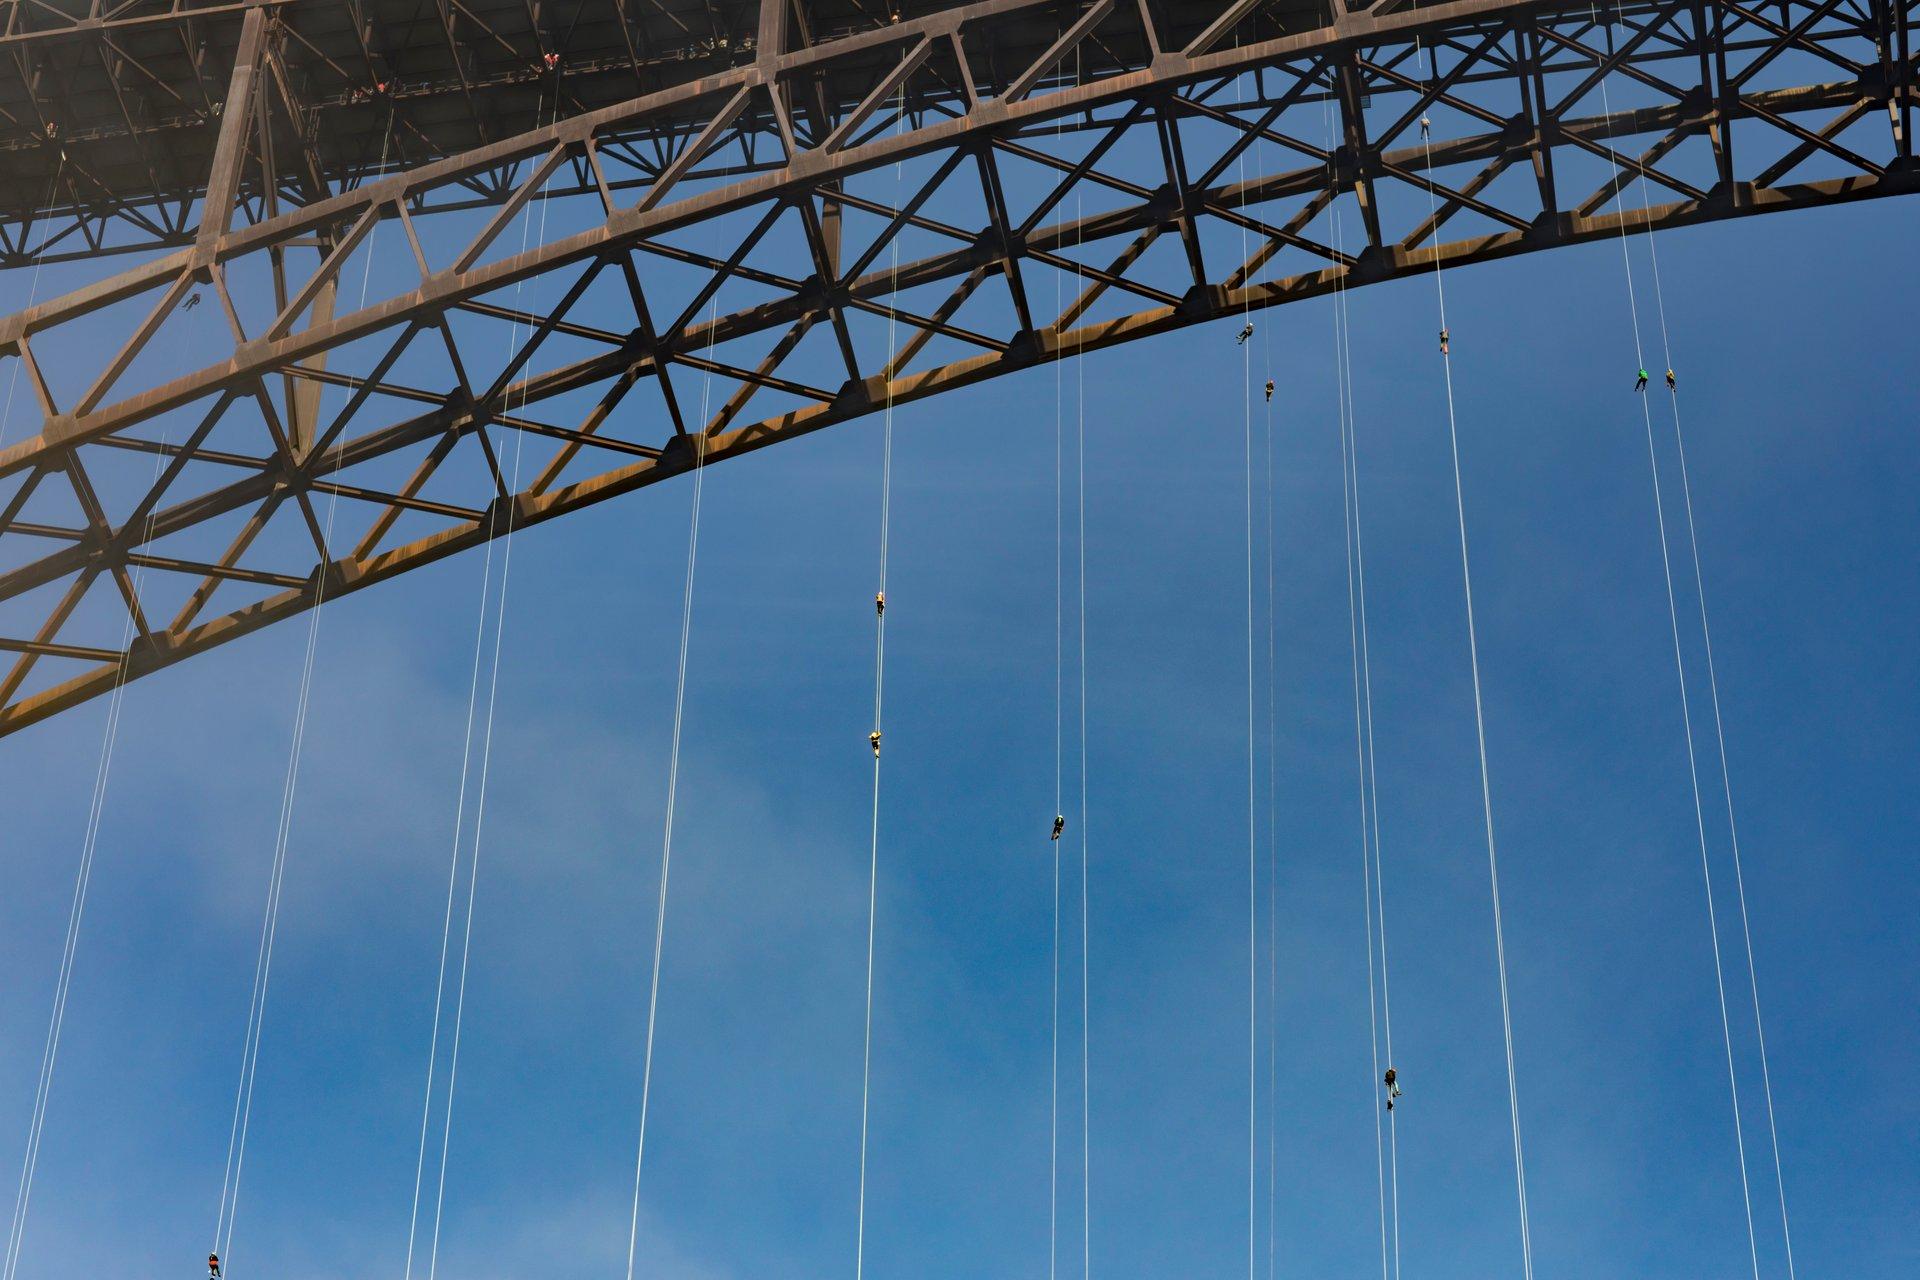 Bridge Day in West Virginia - Best Season 2020